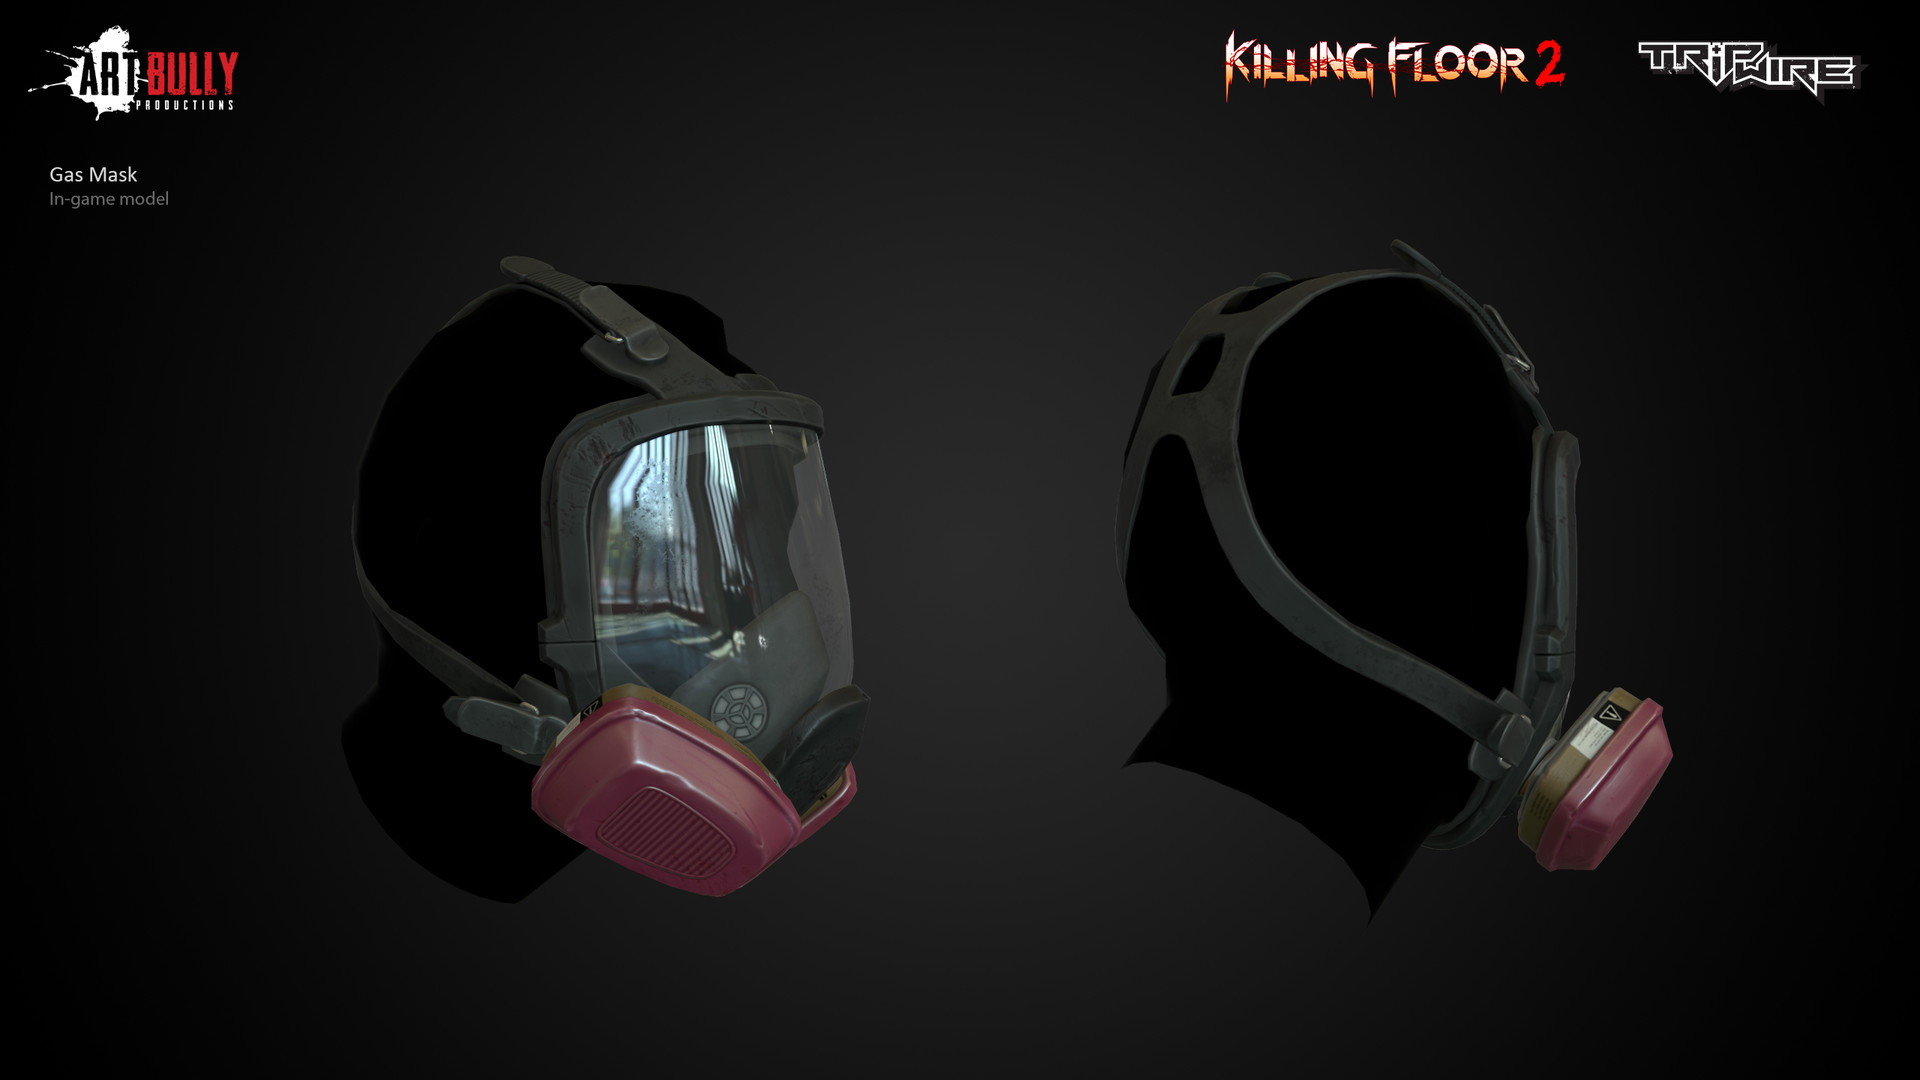 Chx emond gasmask 2